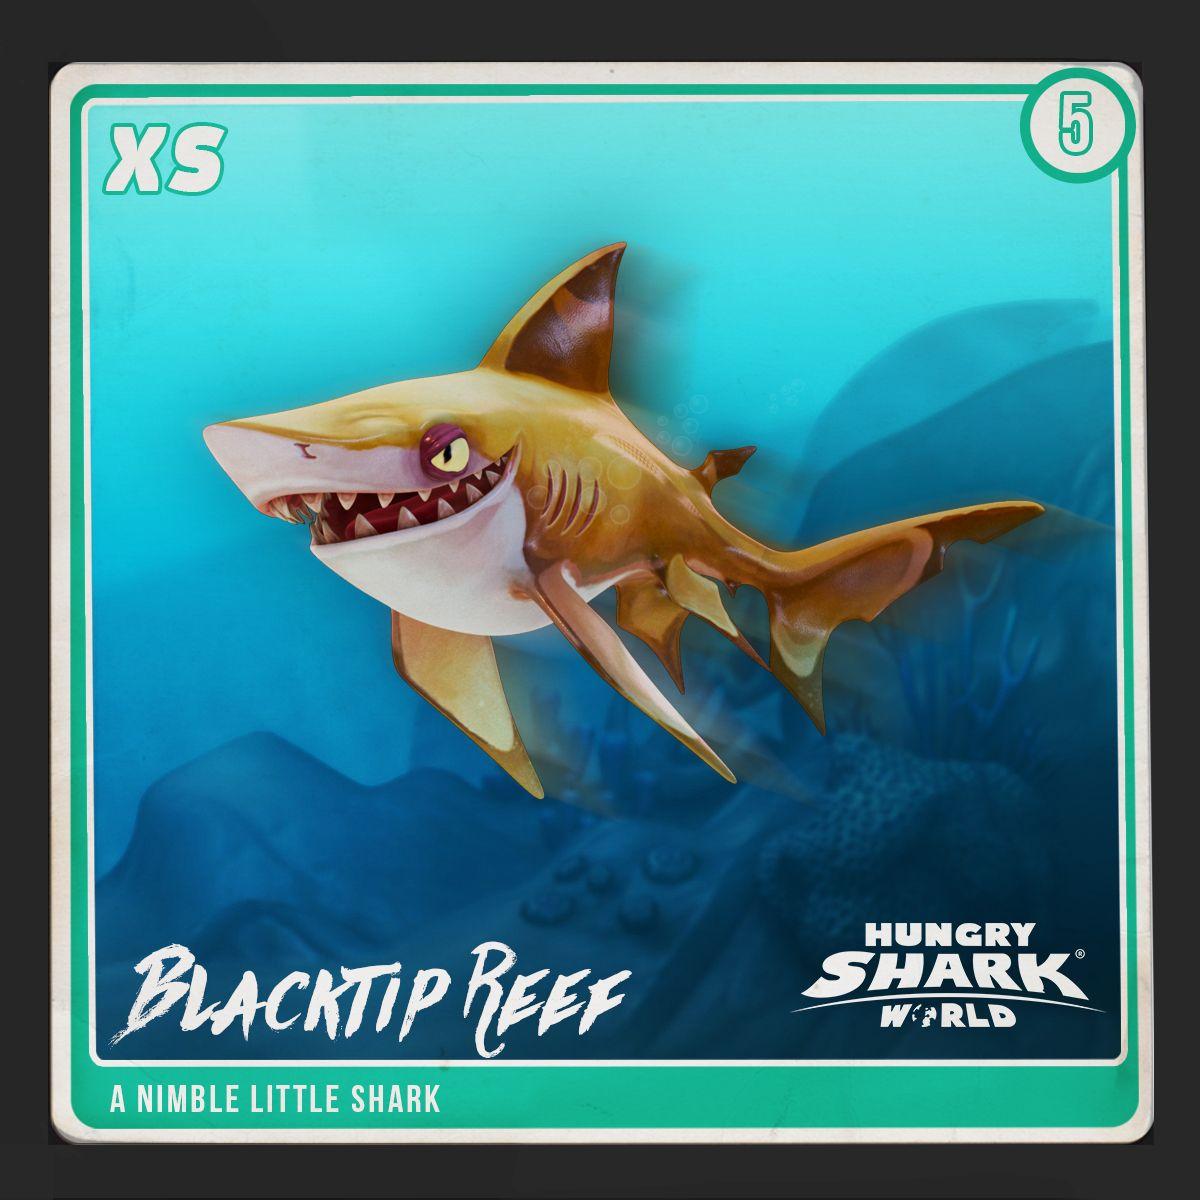 sharkarium card number 5 blacktip reef hungry shark world